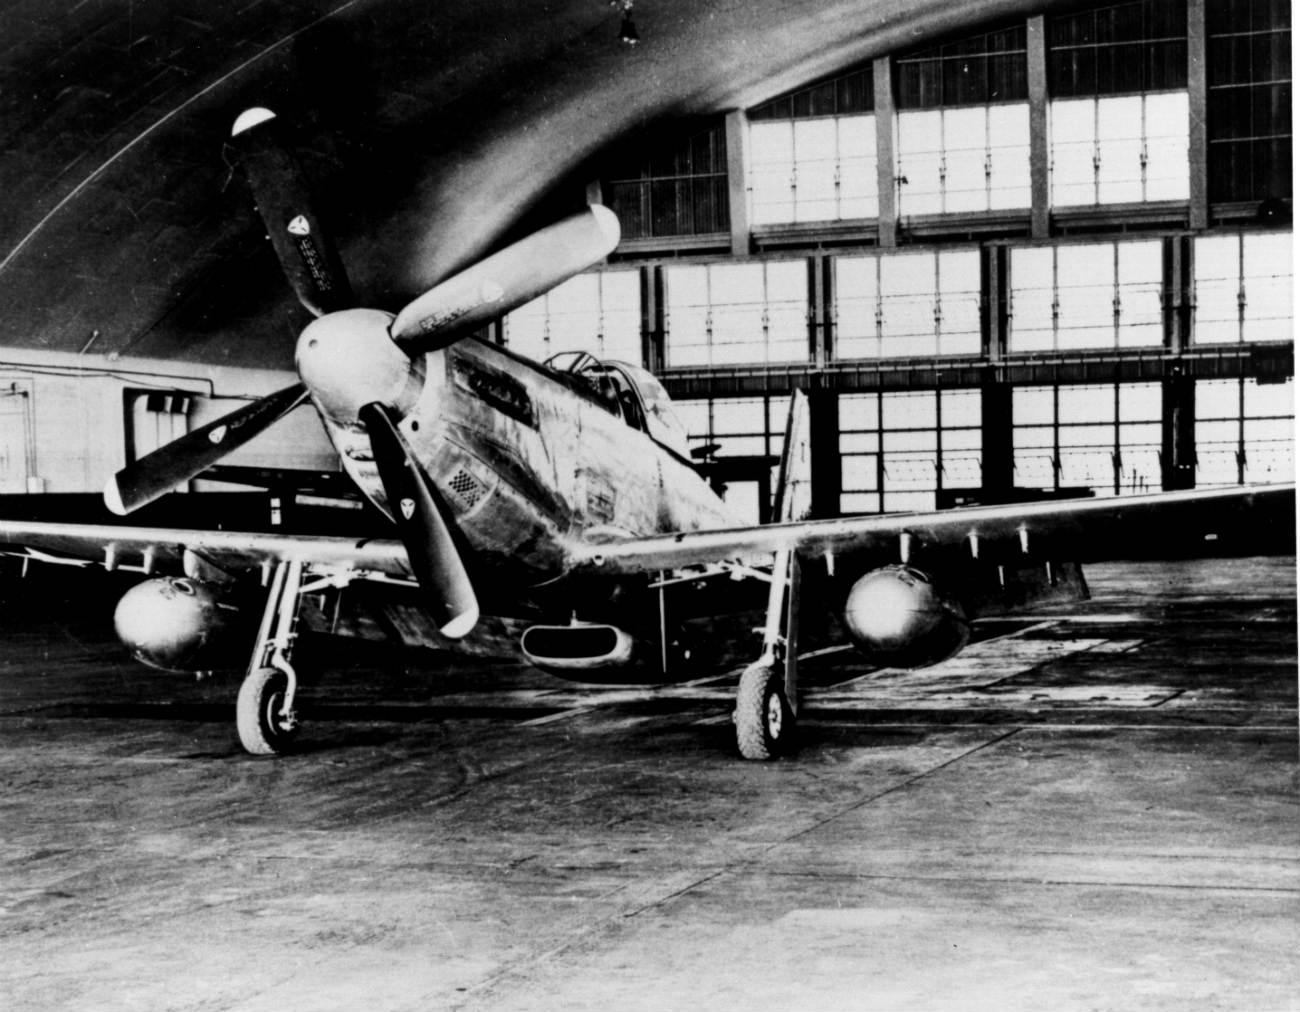 p-51 Mustang images hanger